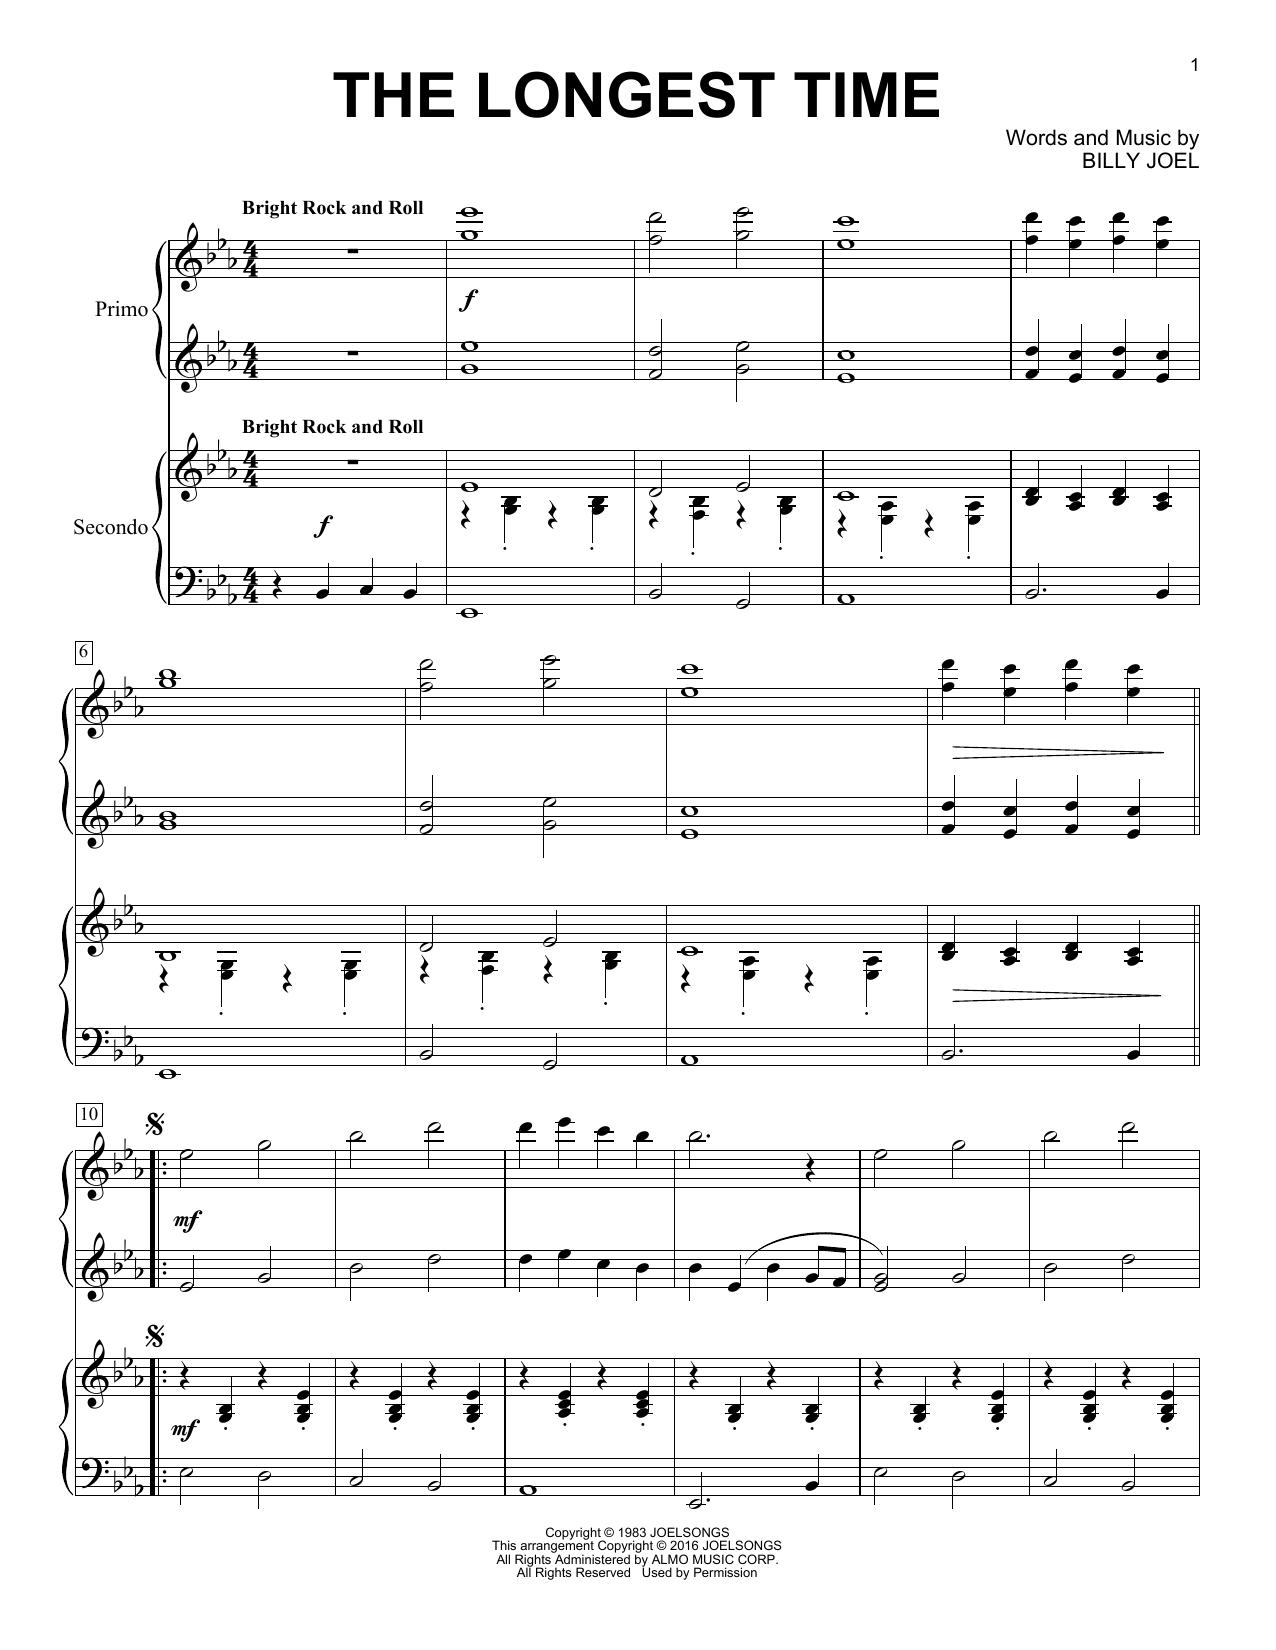 Partition piano The Longest Time de Billy Joel - 4 mains